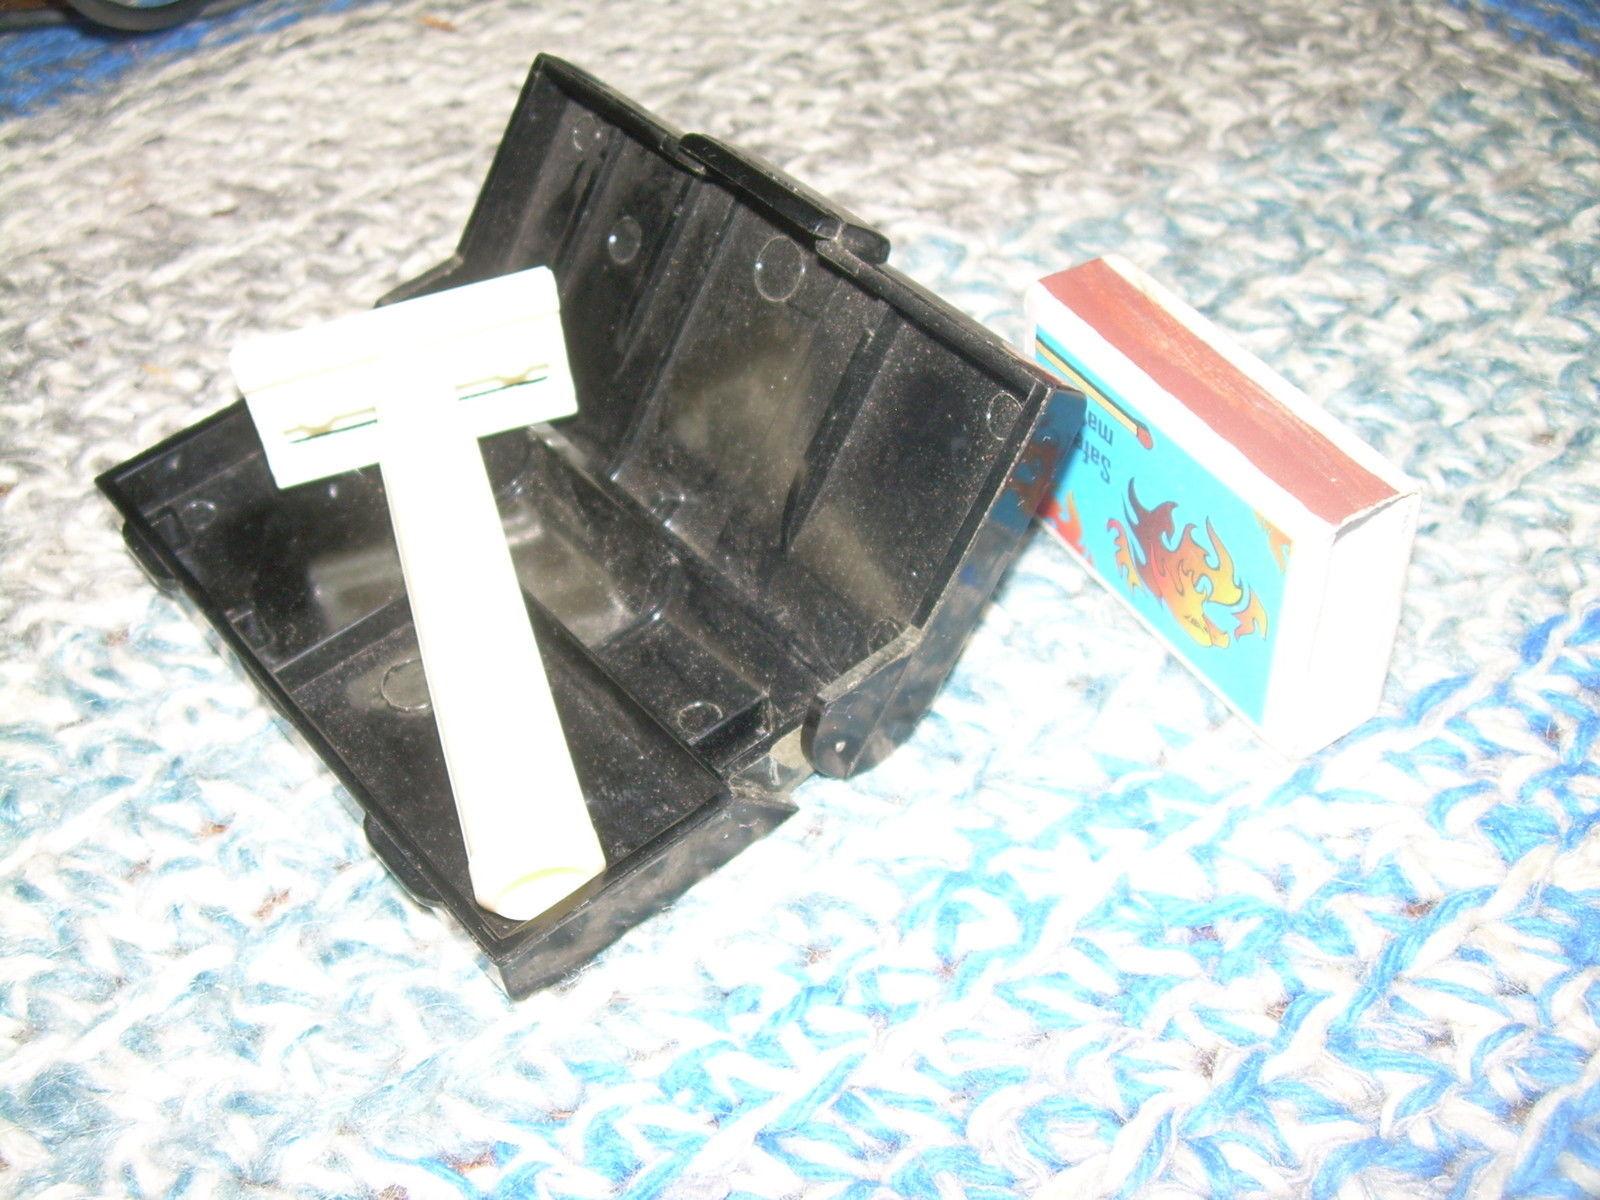 Rare Antique Russian Soviet USSR Bakelite Safety Razor In Box 1970